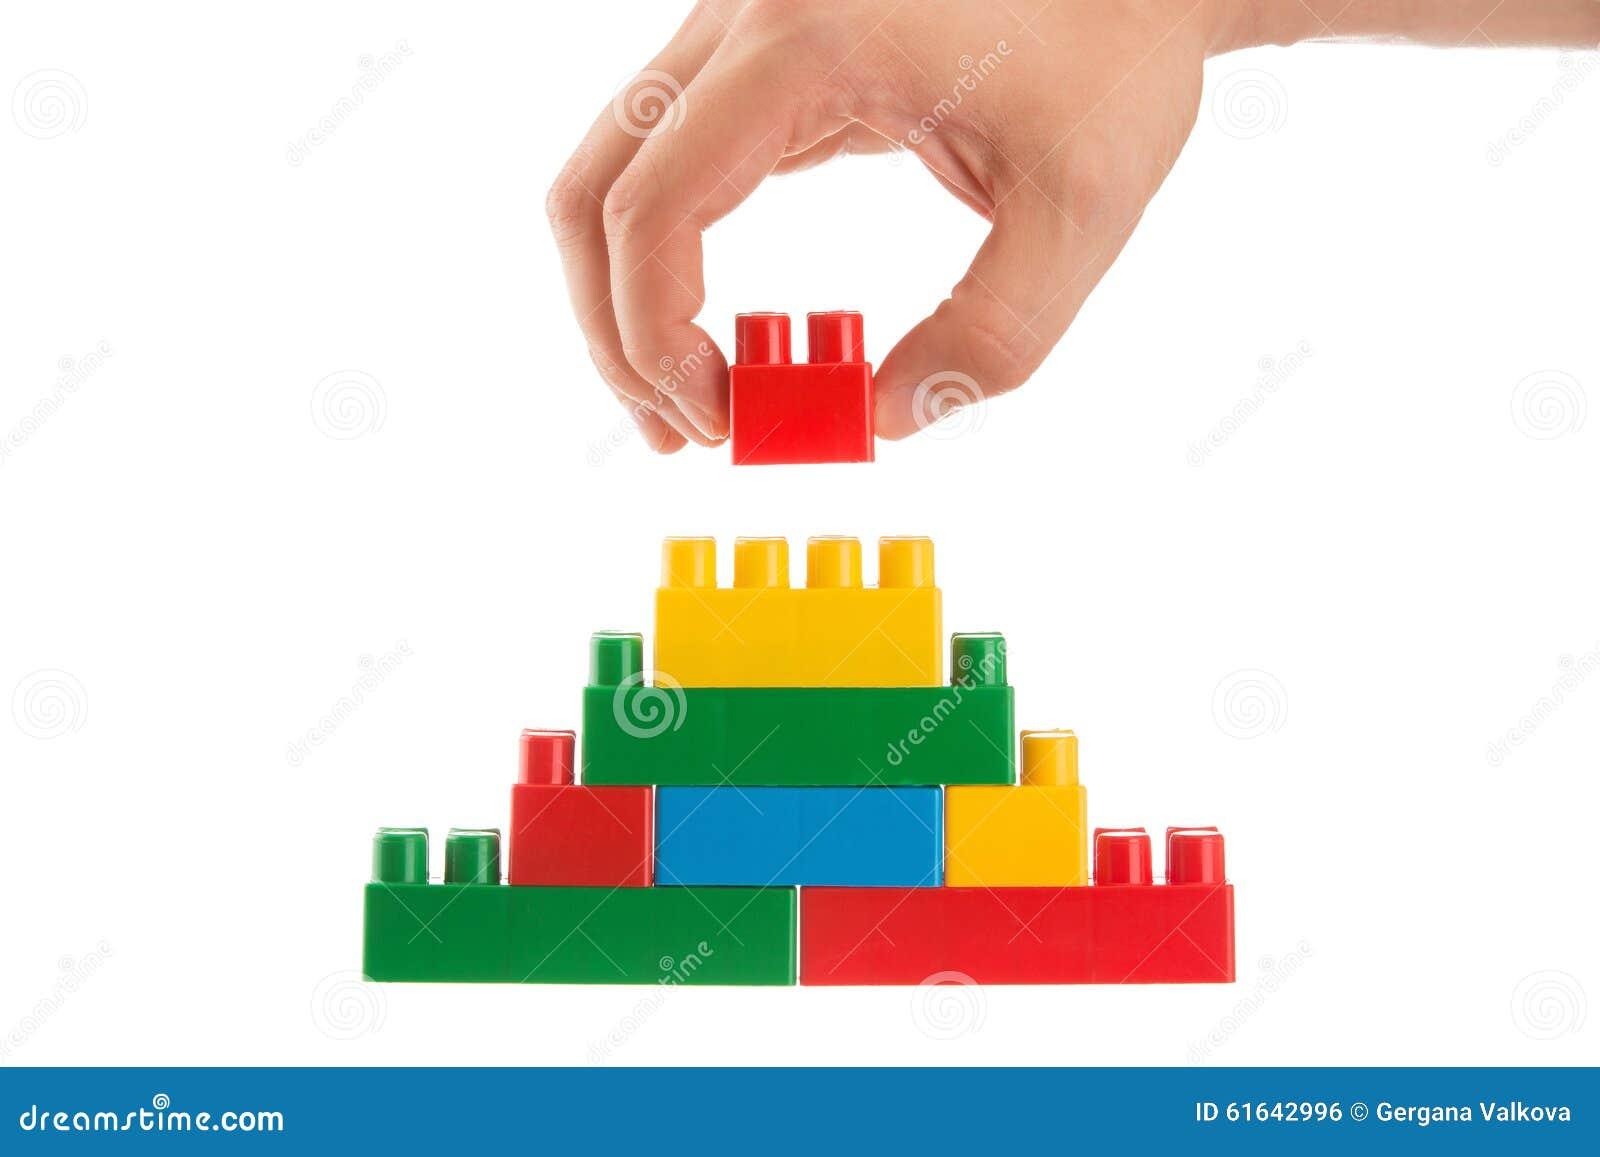 LEGO Retrospective a great exercise for your Retrospective